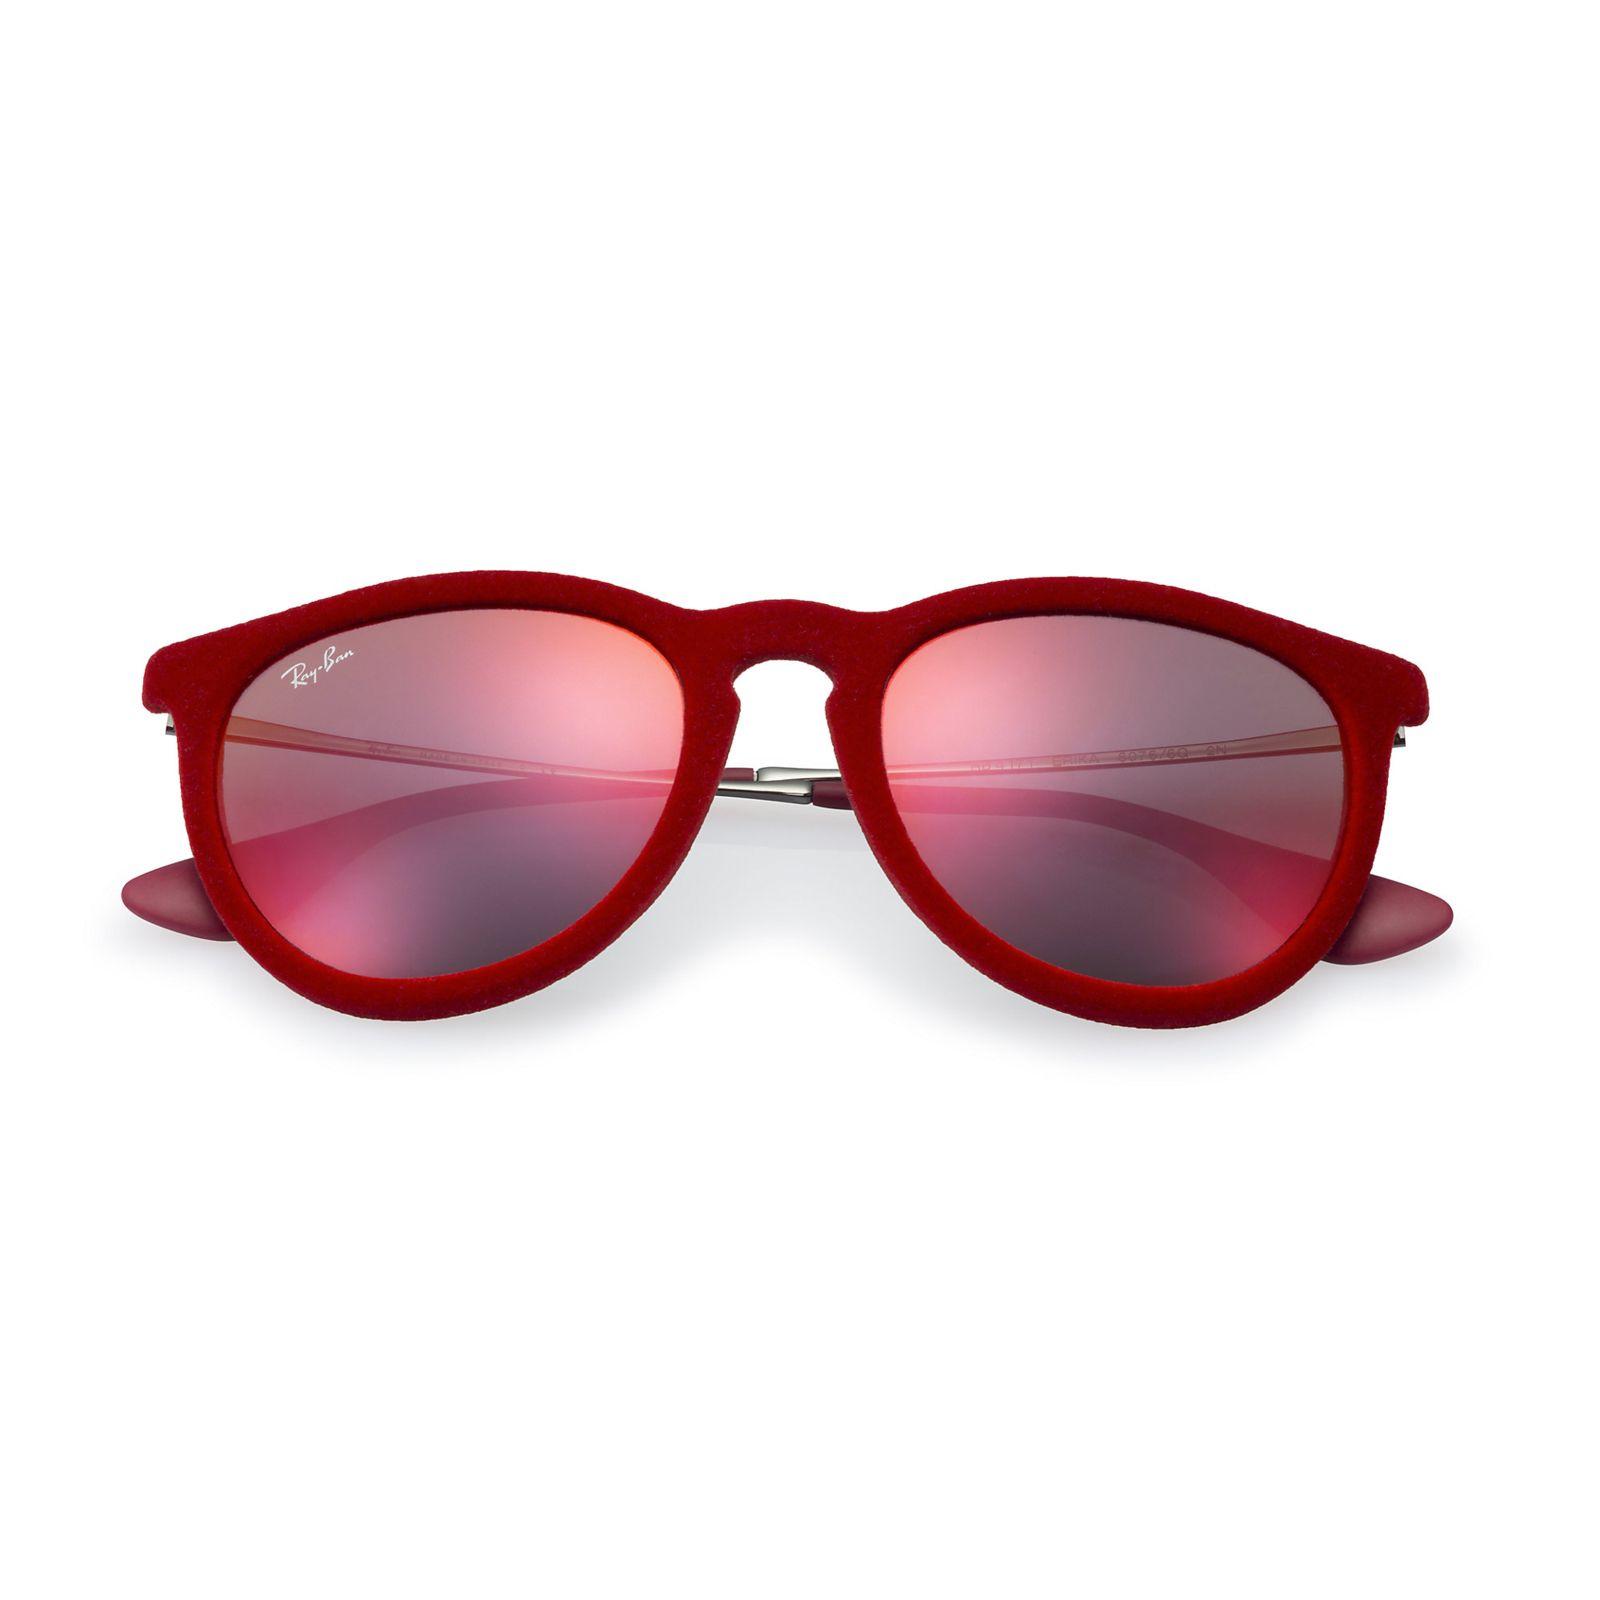 9a4761d814a43 Óculos De Sol Ray-Ban Erika Veludo RB4171 Vermelho - Marca Ray-Ban ...